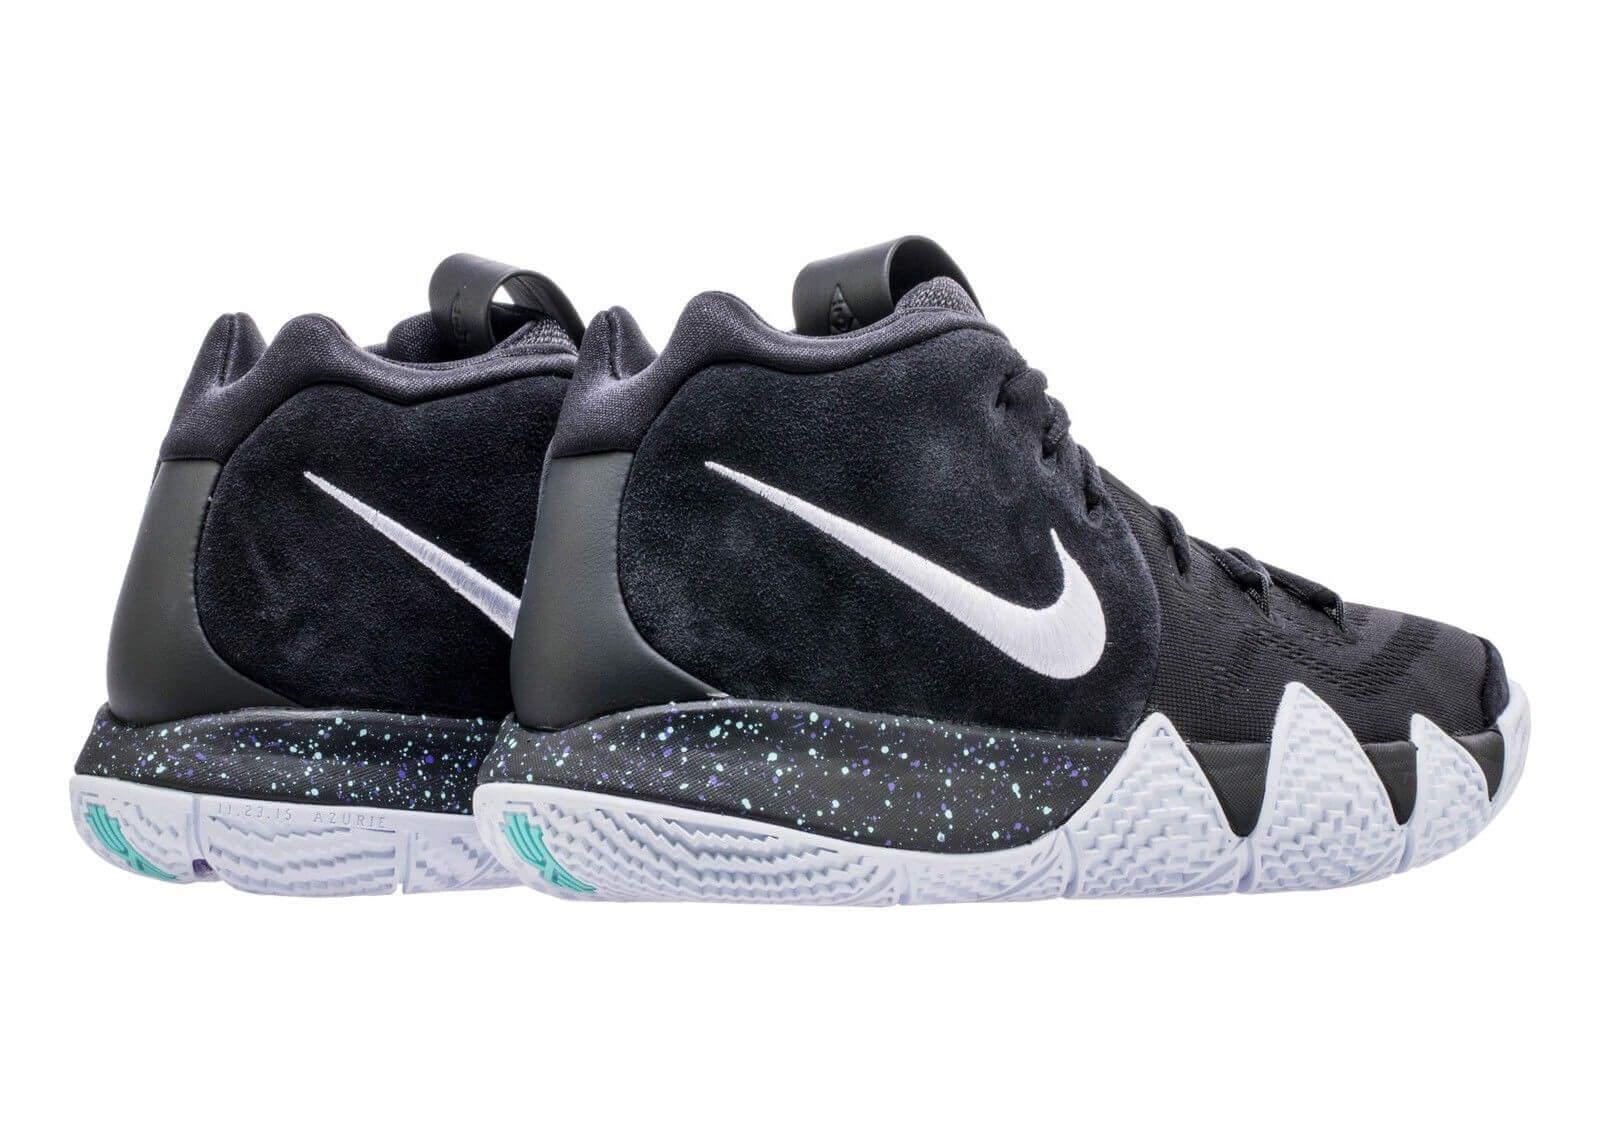 4924c5576bd Nike Kyrie 4 943806-002 1 – ARCH-USA